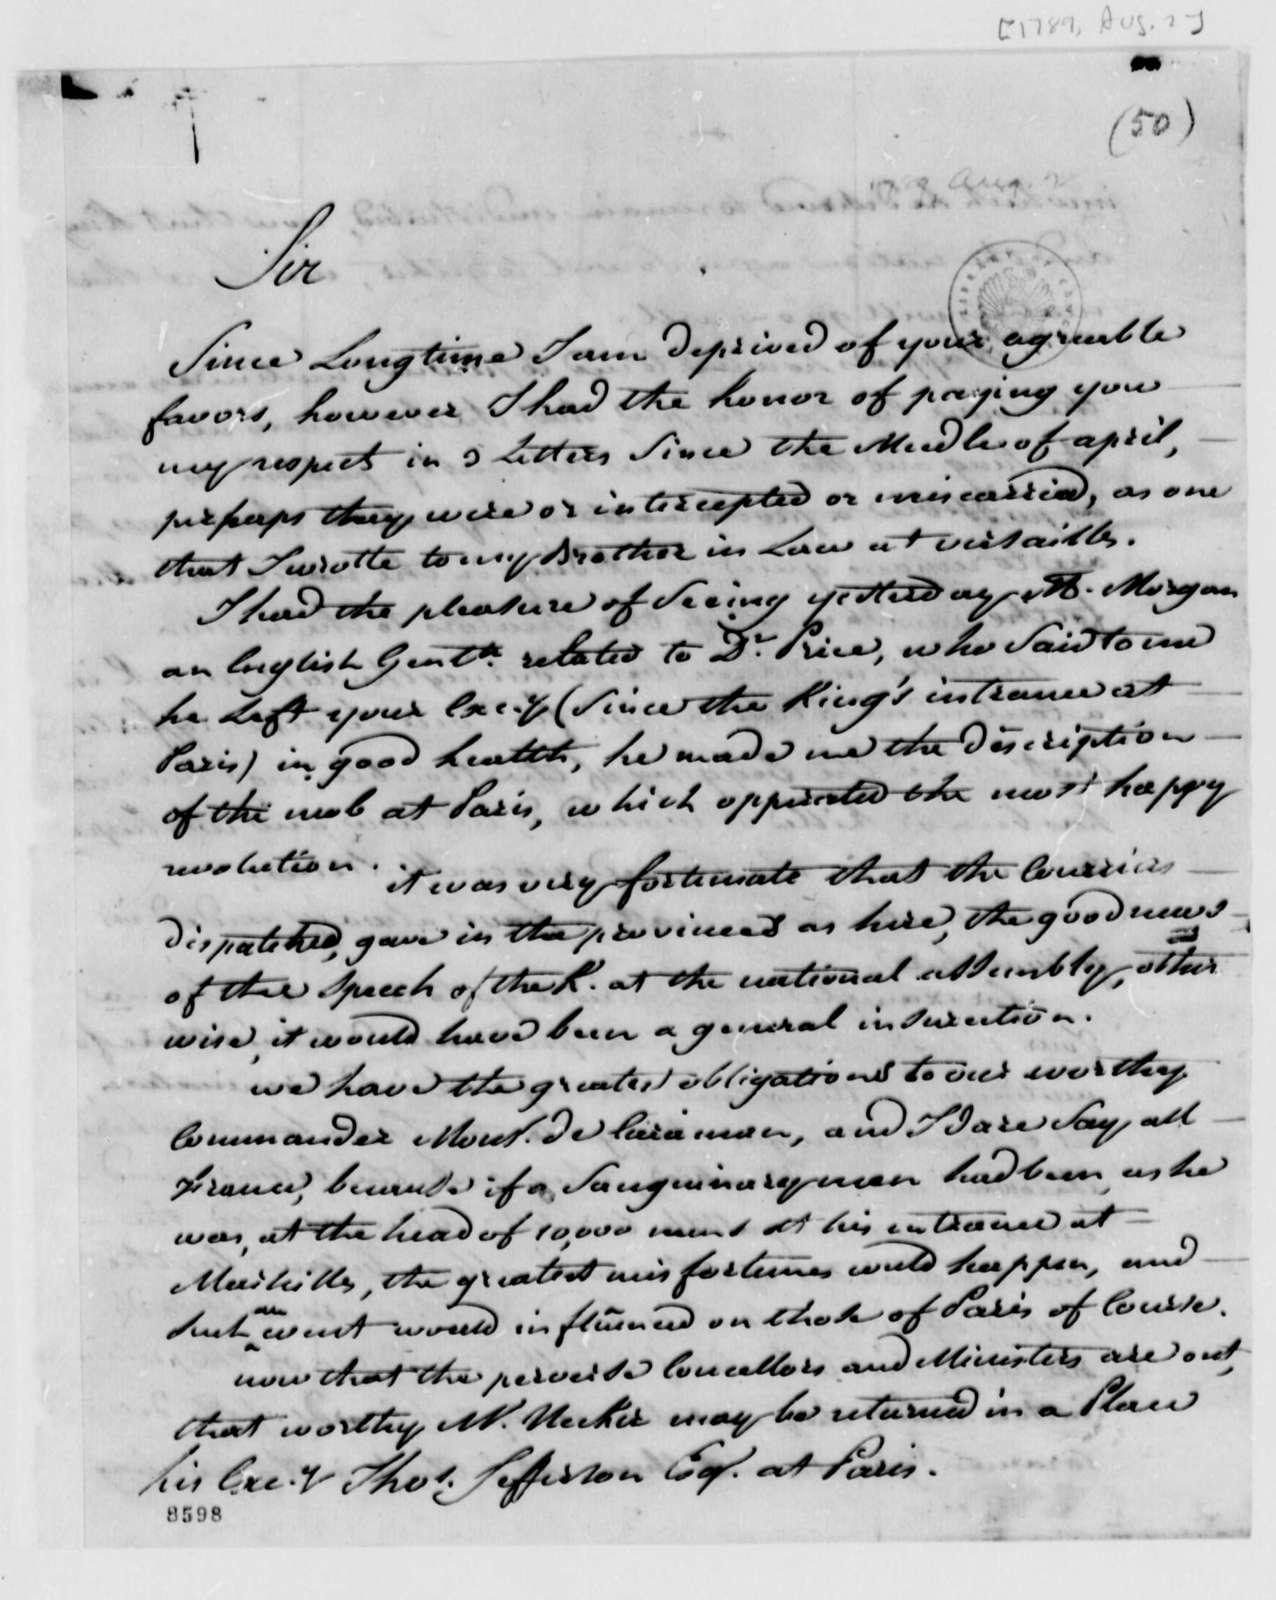 Stephen Cathalan, Jr. to Thomas Jefferson, August 2, 1789